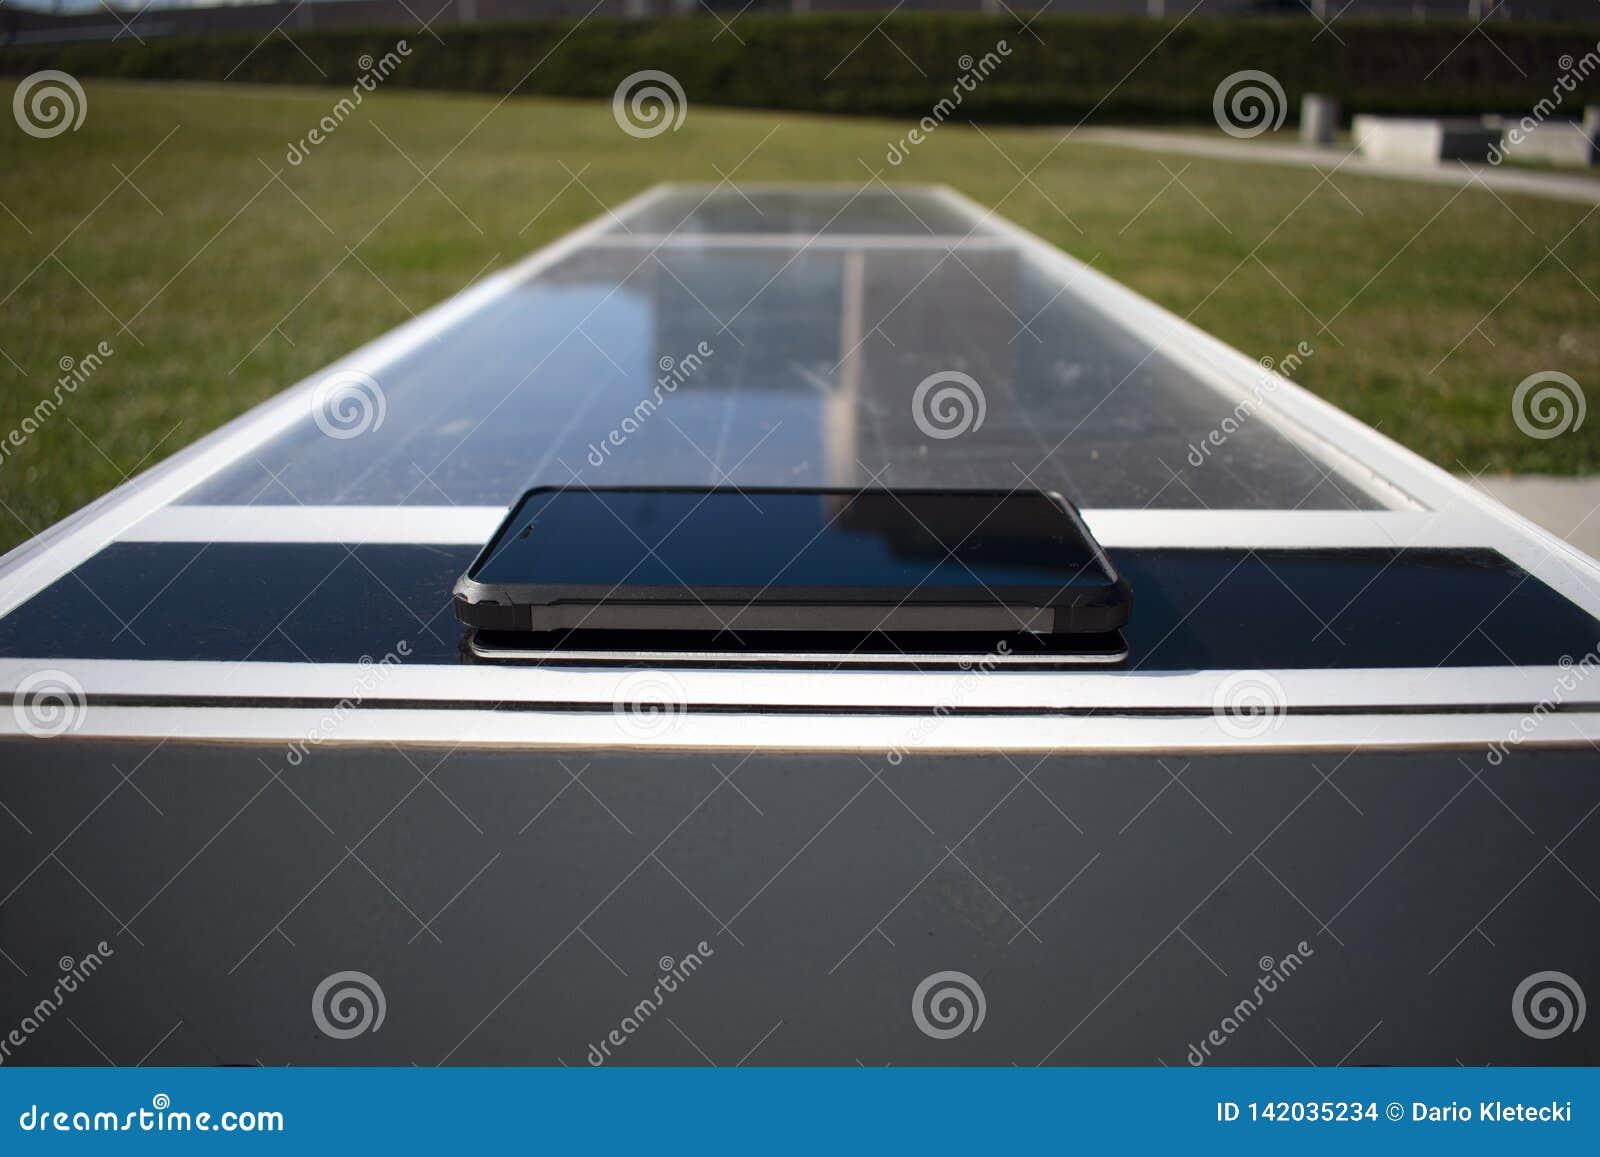 Teléfono móvil que carga remotamente en un banco solar